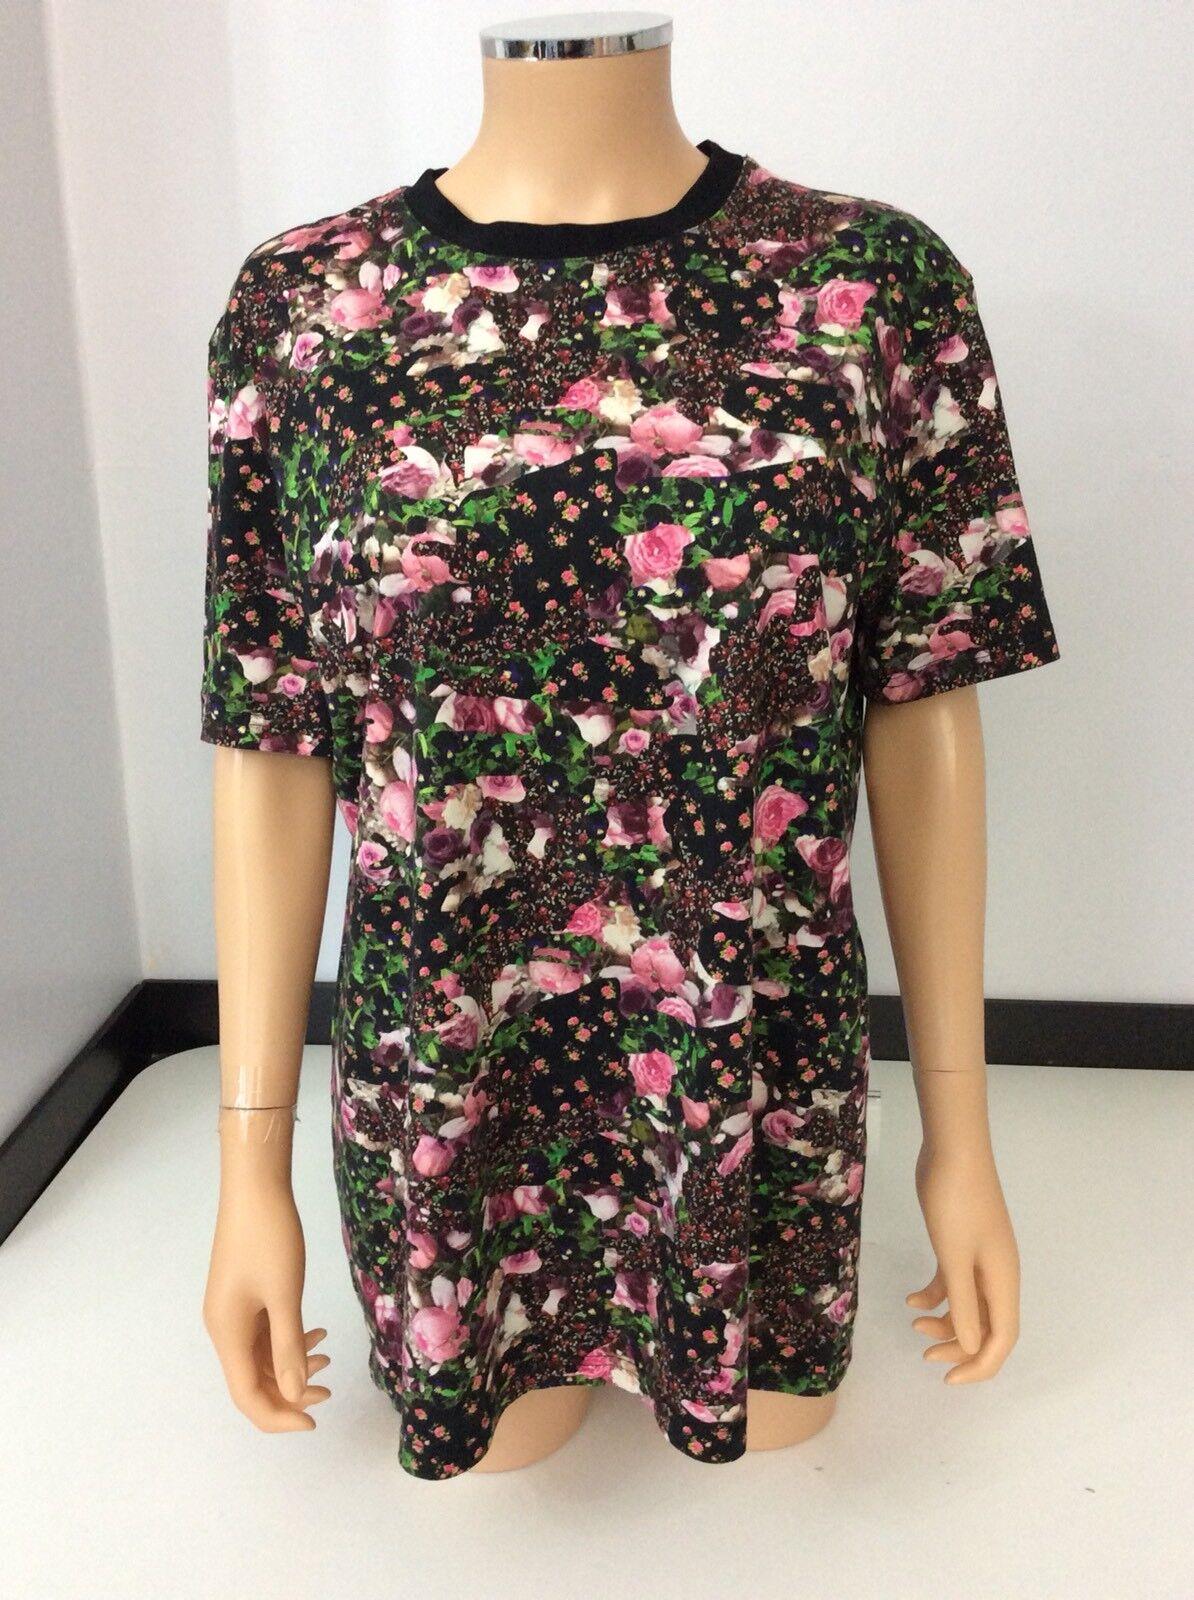 Givenchy t shirt Top Floral Größe S Small Short Sleeve Flowers Over Größe